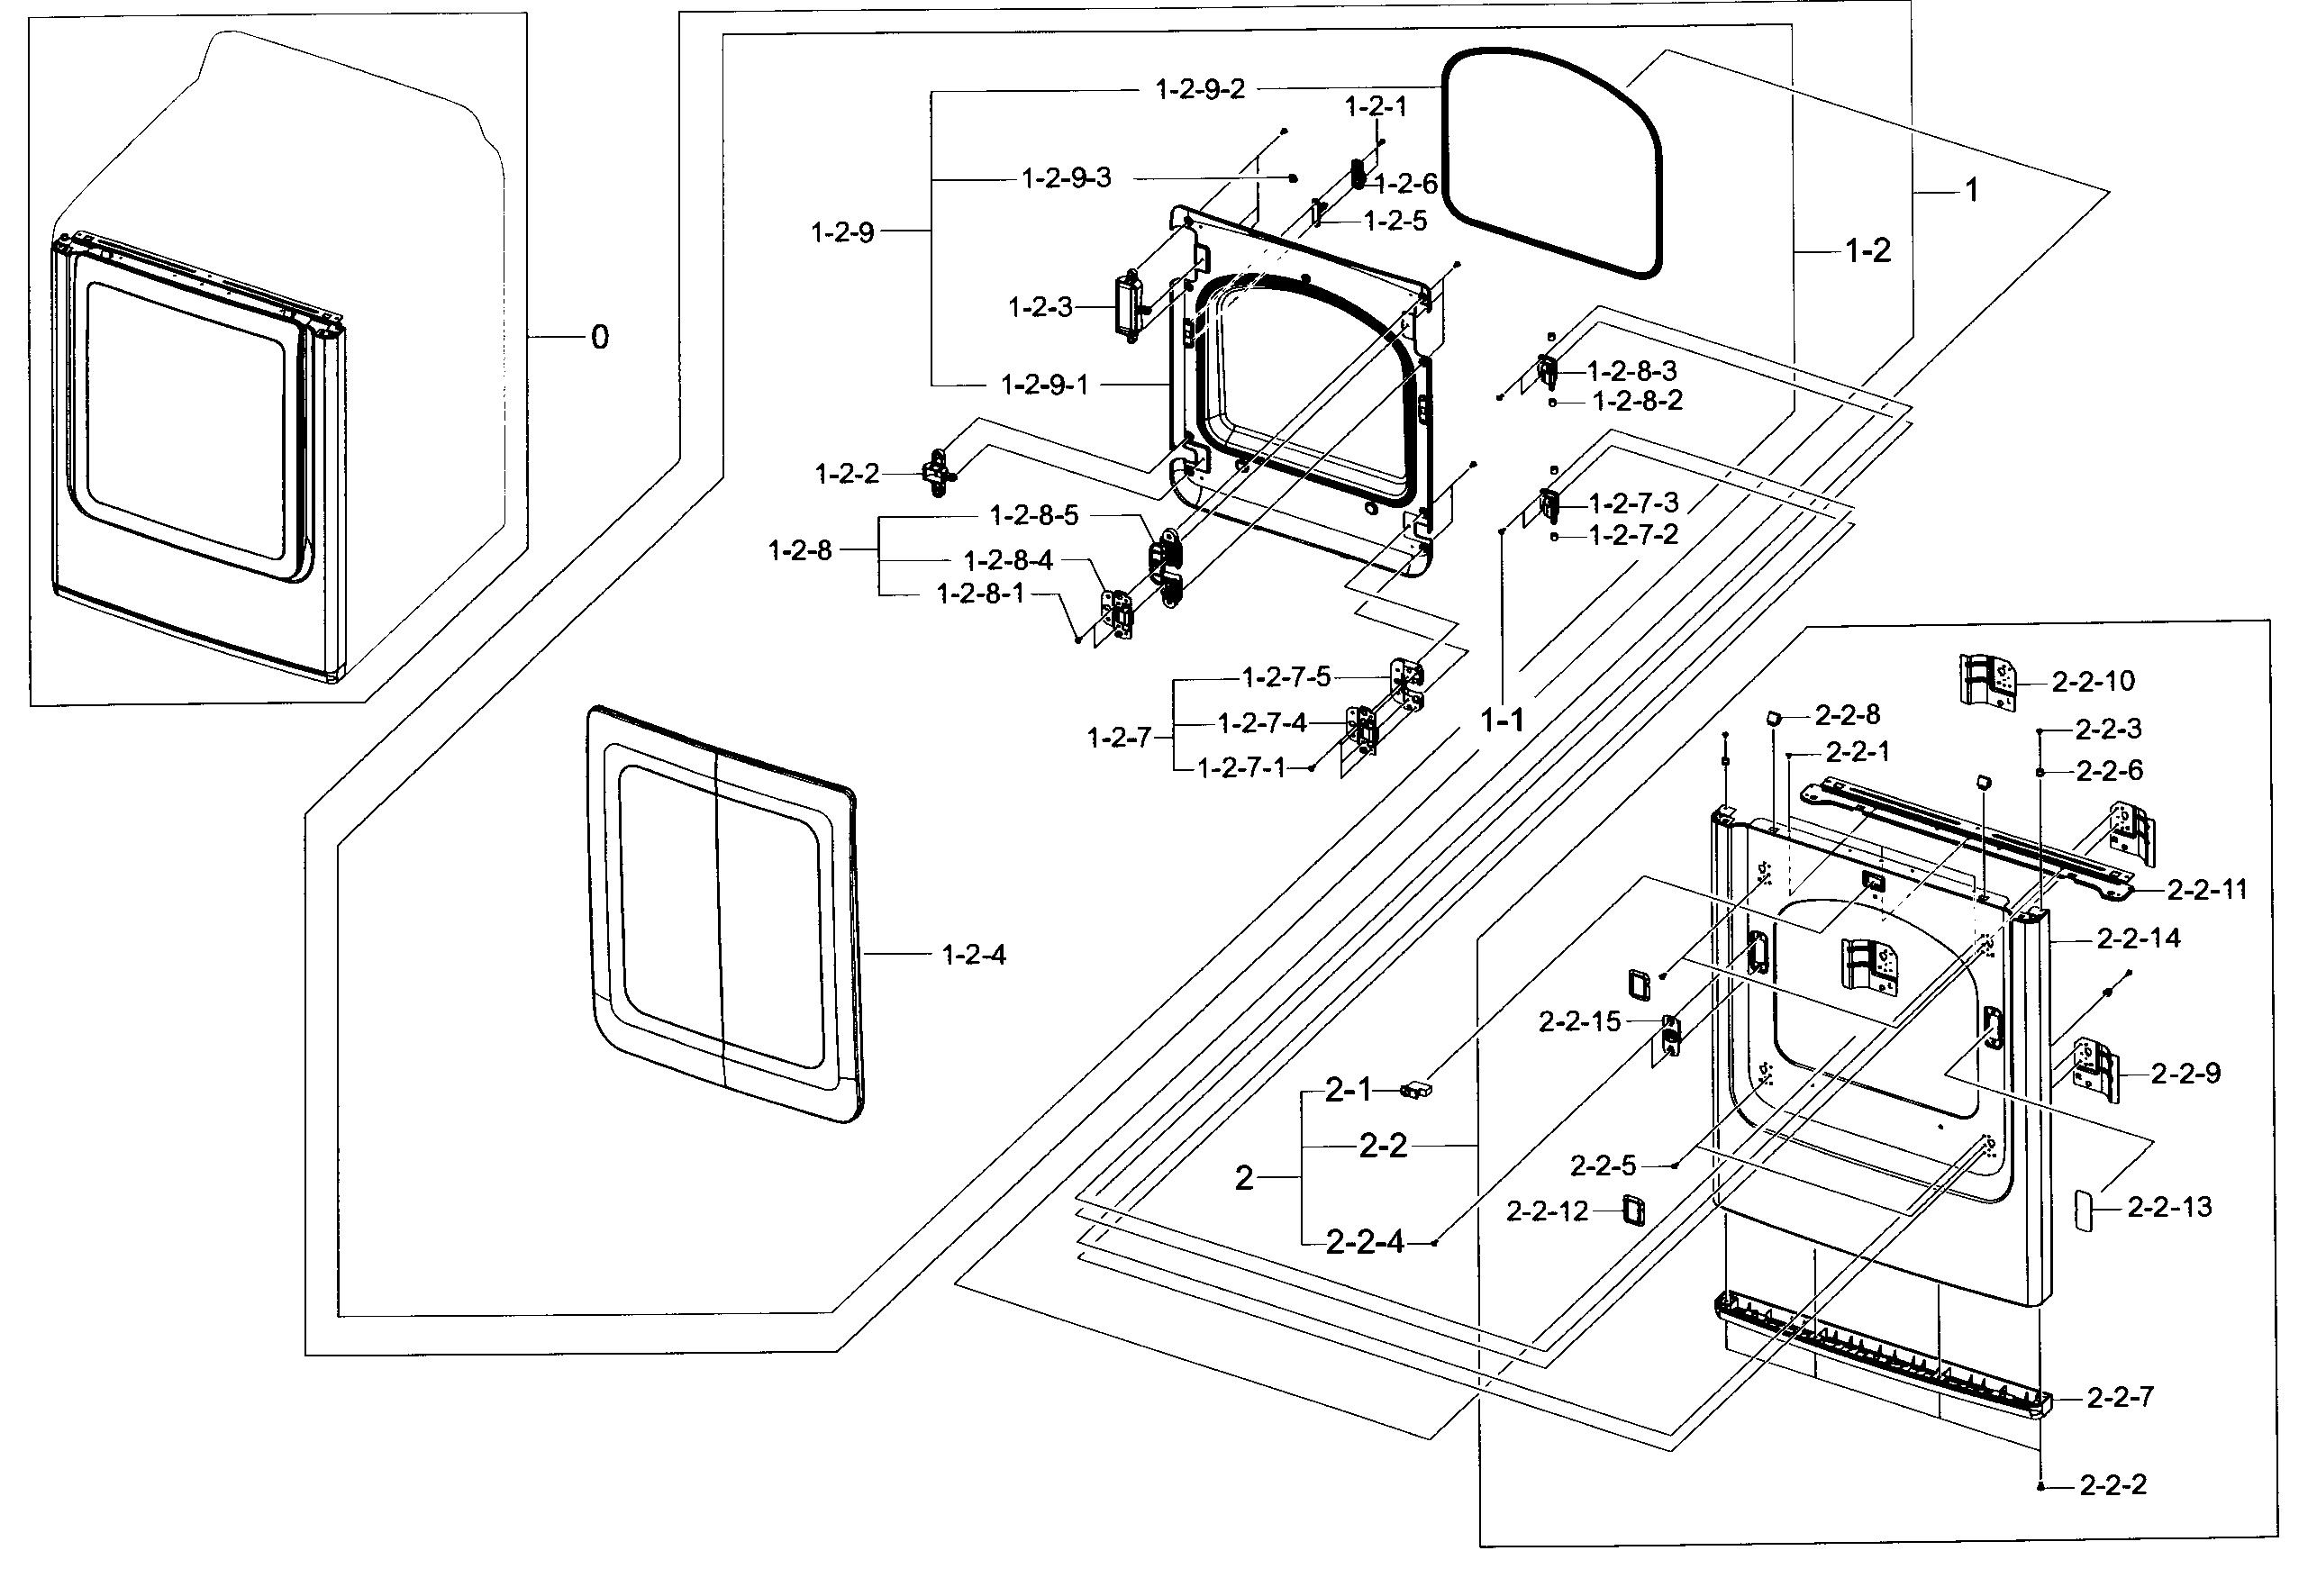 samsung dryer wiring diagram nc 6796  wiring for dryer heating element download diagram samsung dryer wiring schematic wiring for dryer heating element